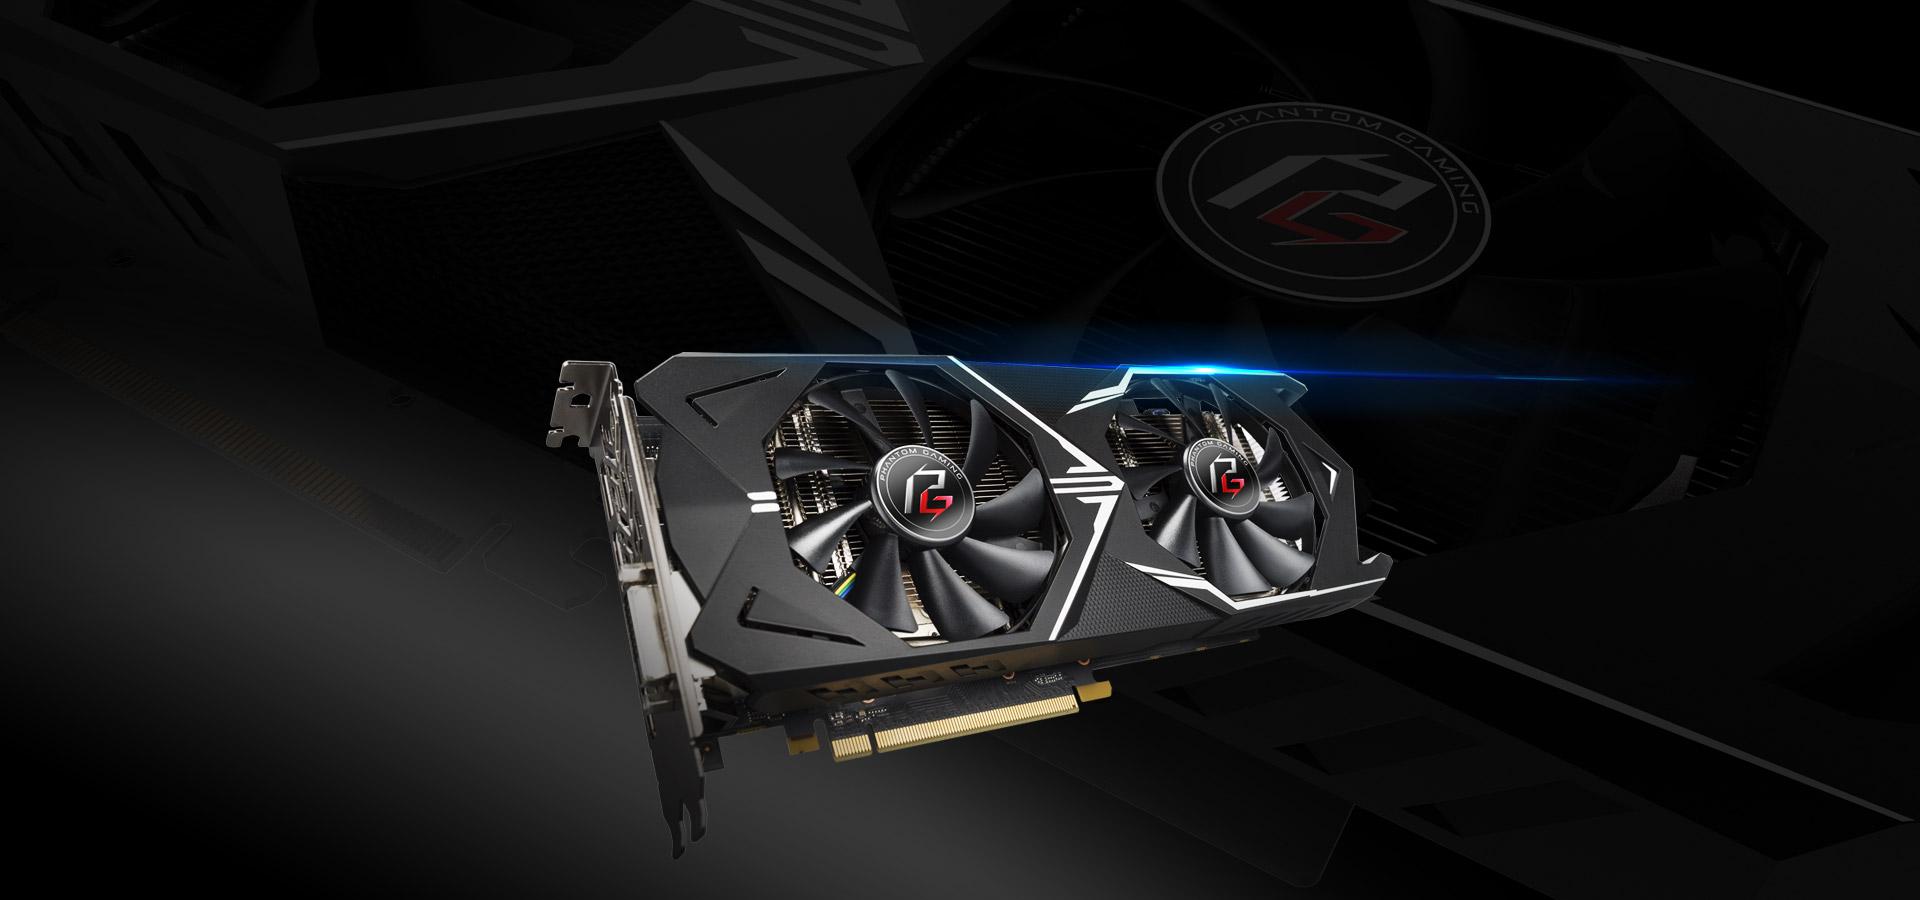 ASROCK AMD RADEON PHANTOM GXR RX570 4G OC